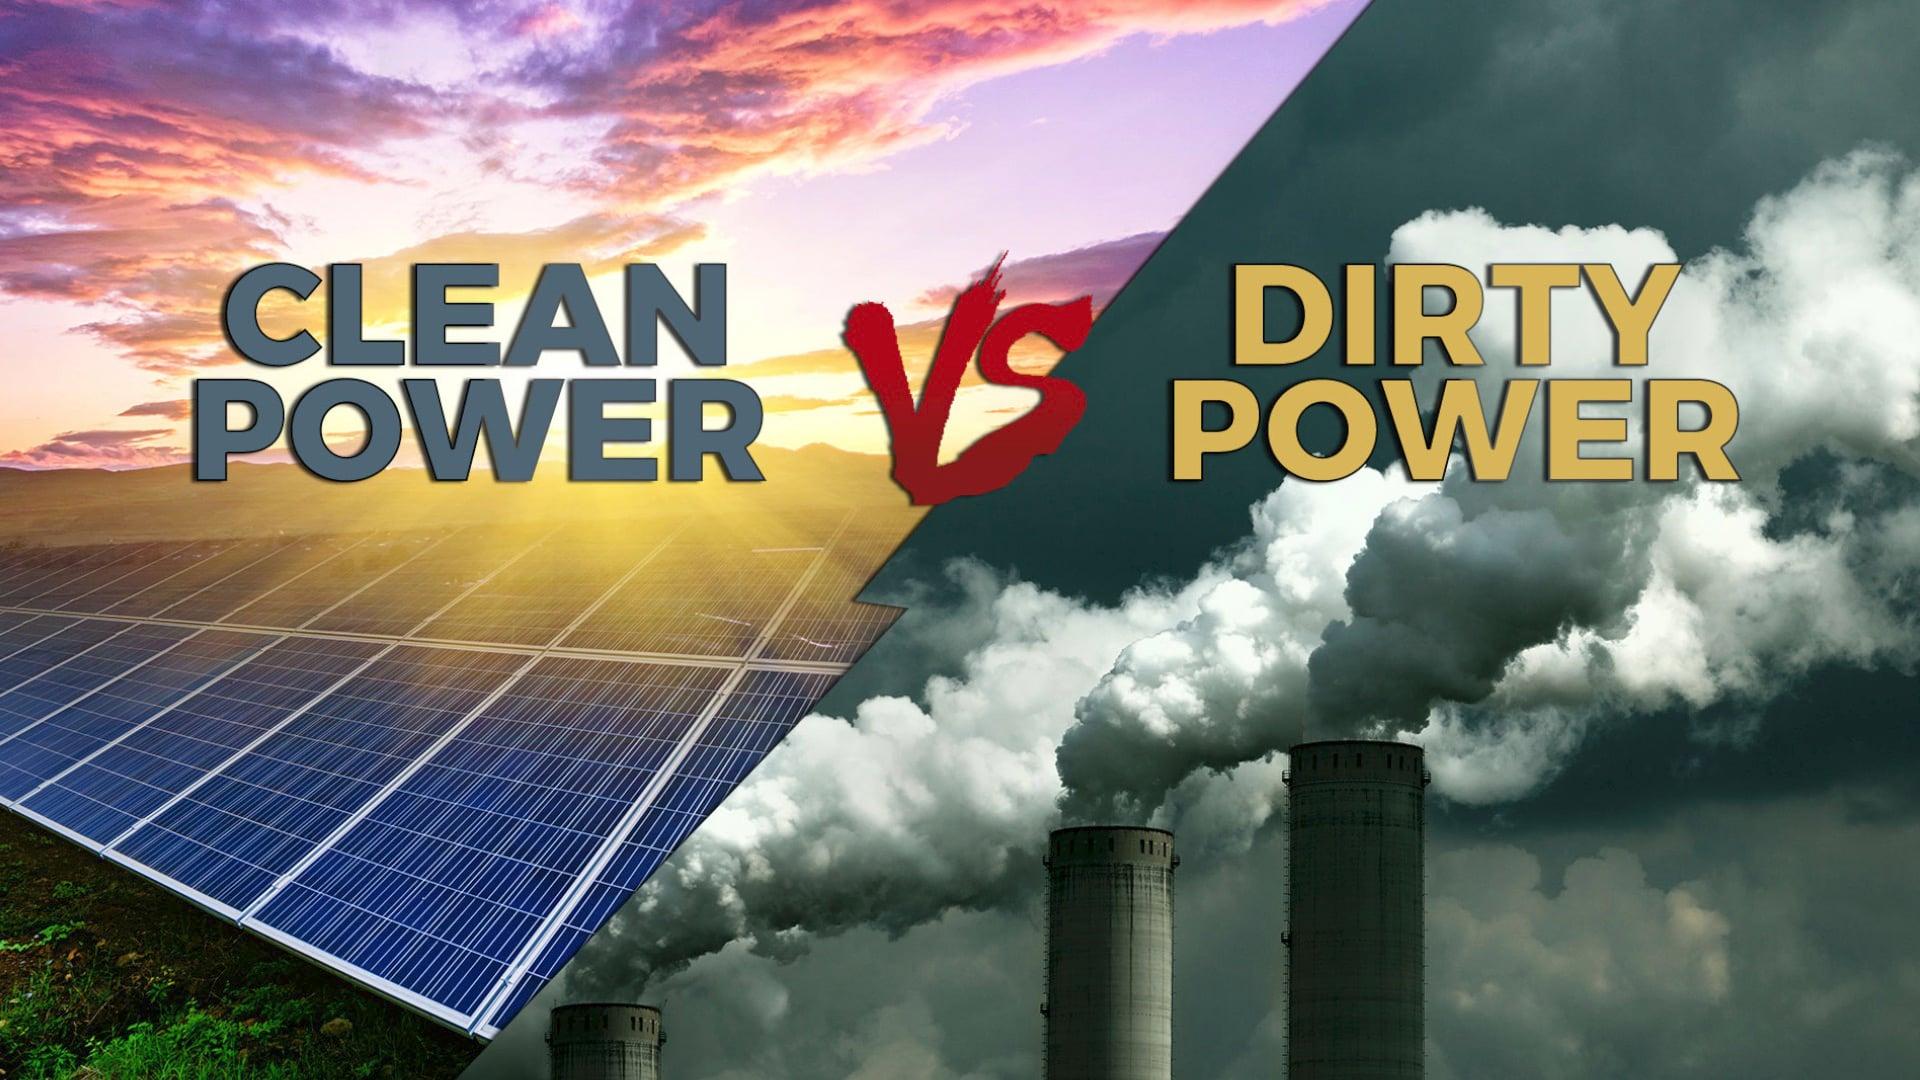 Clean VS Dirty Power (standard)